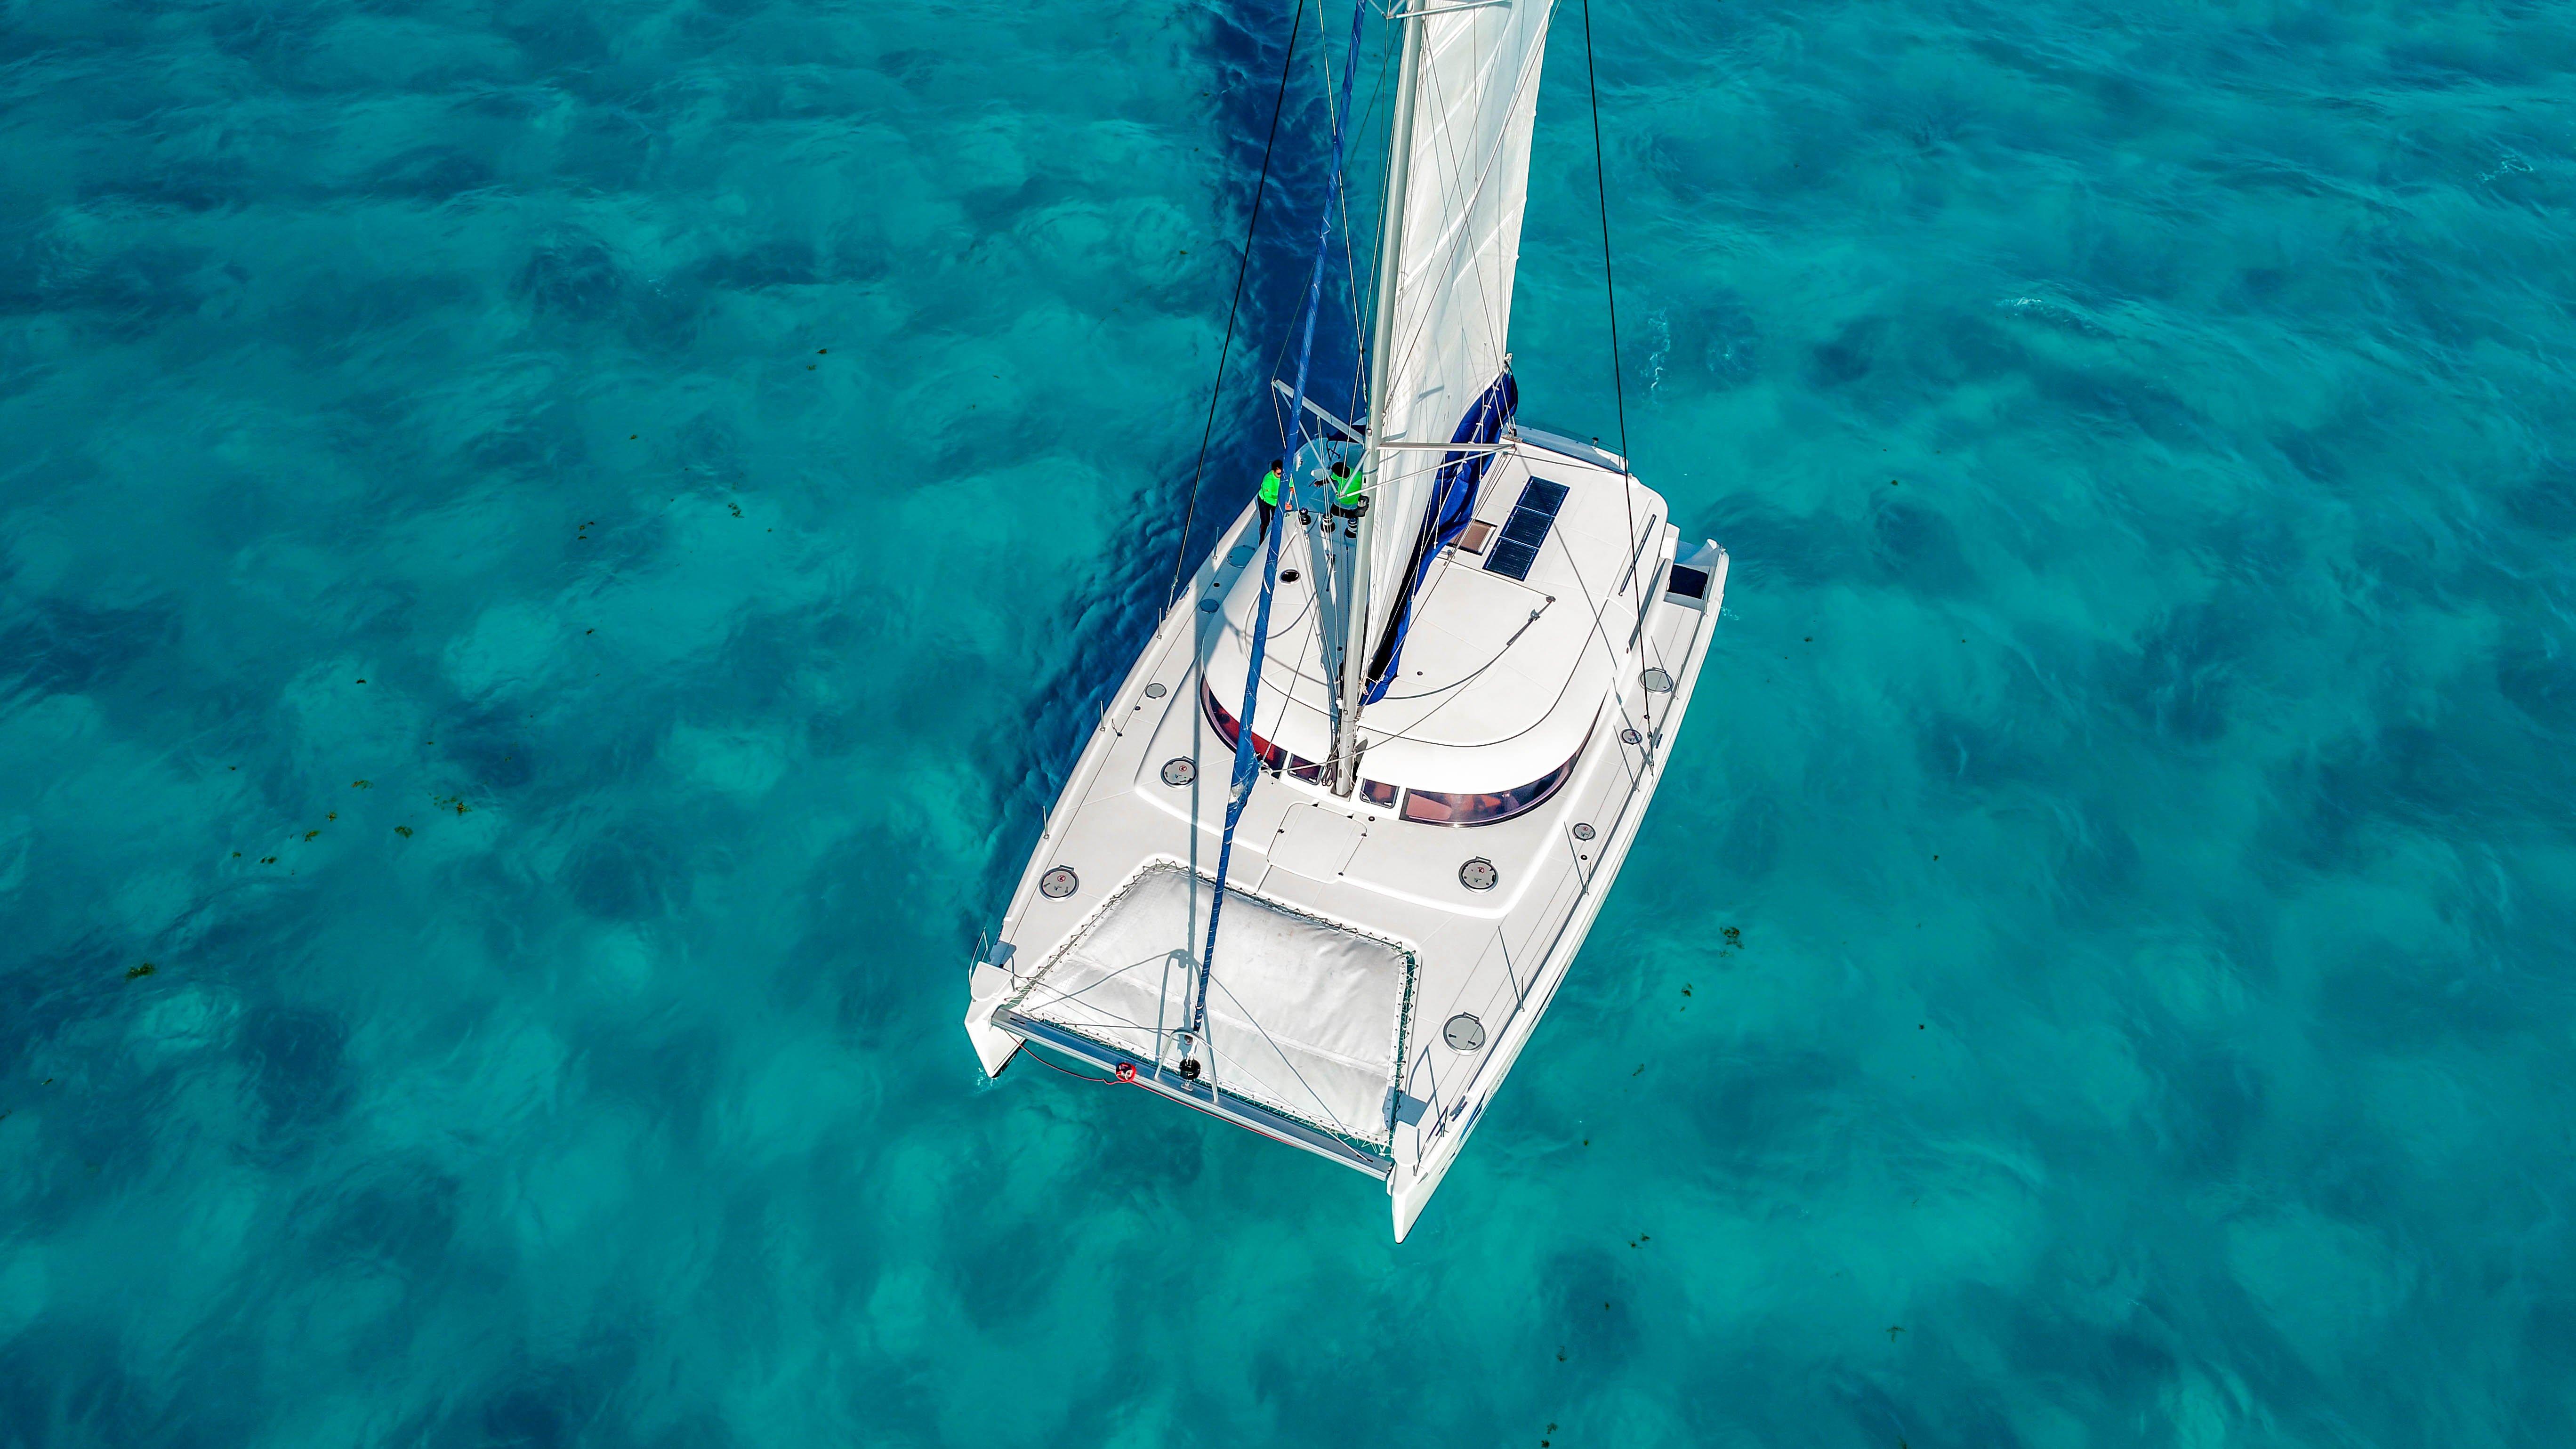 4 - HiRes Megaira- Private tour to Isla Mujeres in catamaran - Cancun Sailing